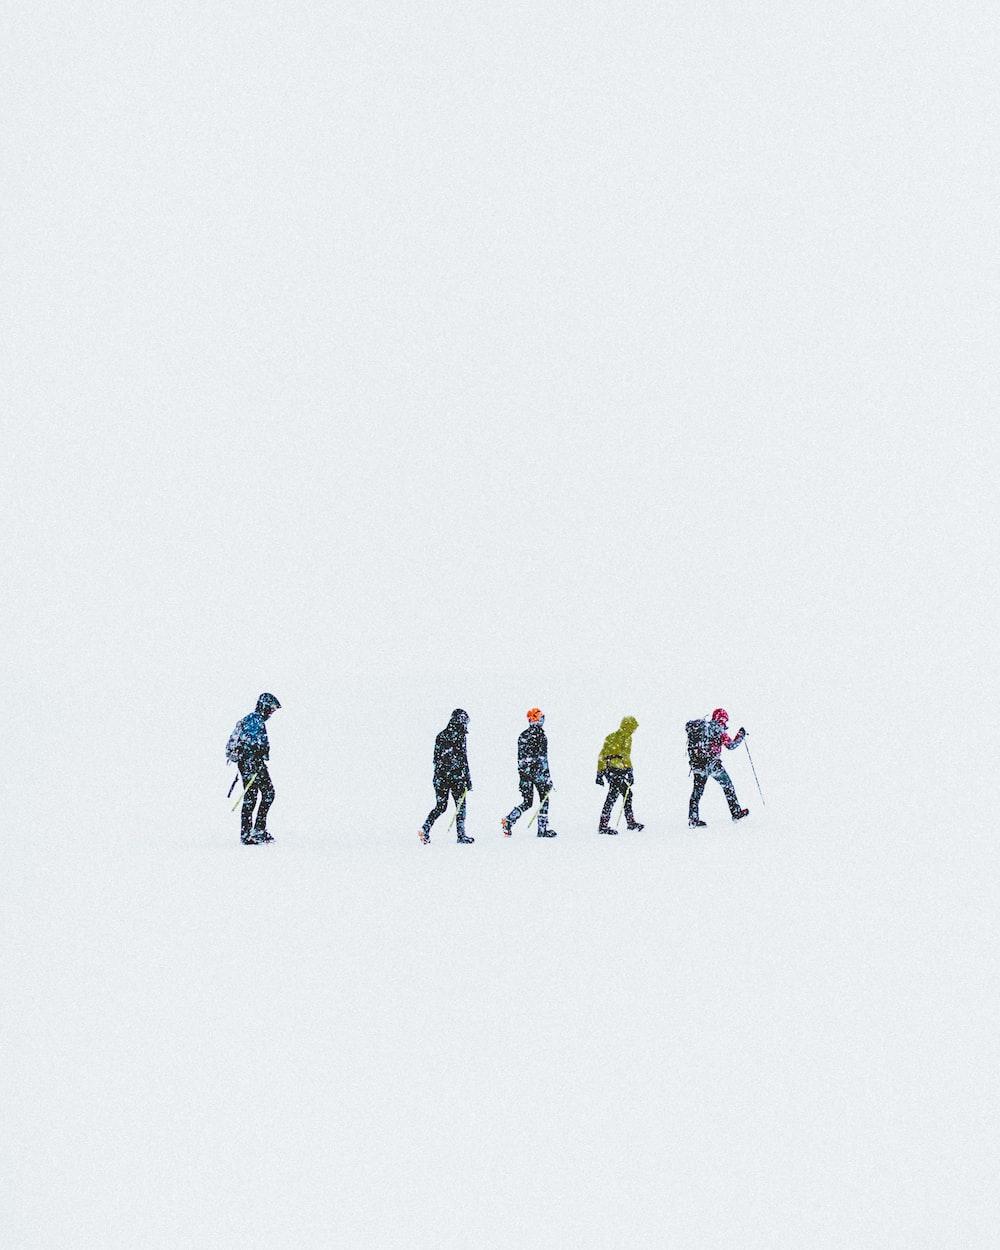 five people on snow